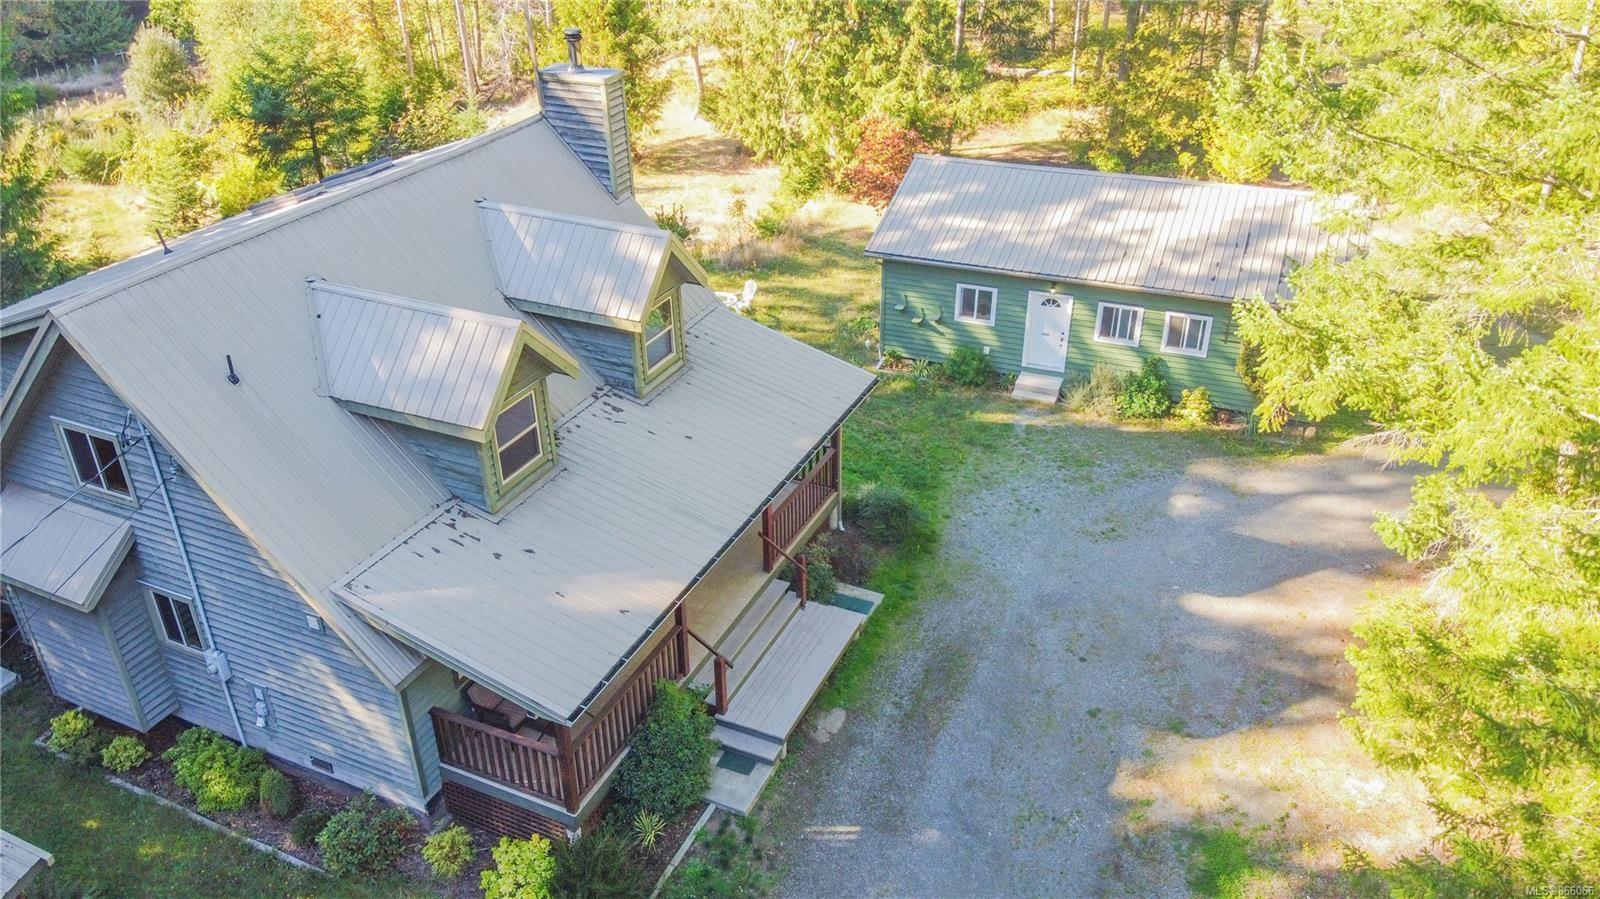 Main Photo: 2690 Kevan Dr in : Isl Gabriola Island House for sale (Islands)  : MLS®# 866066